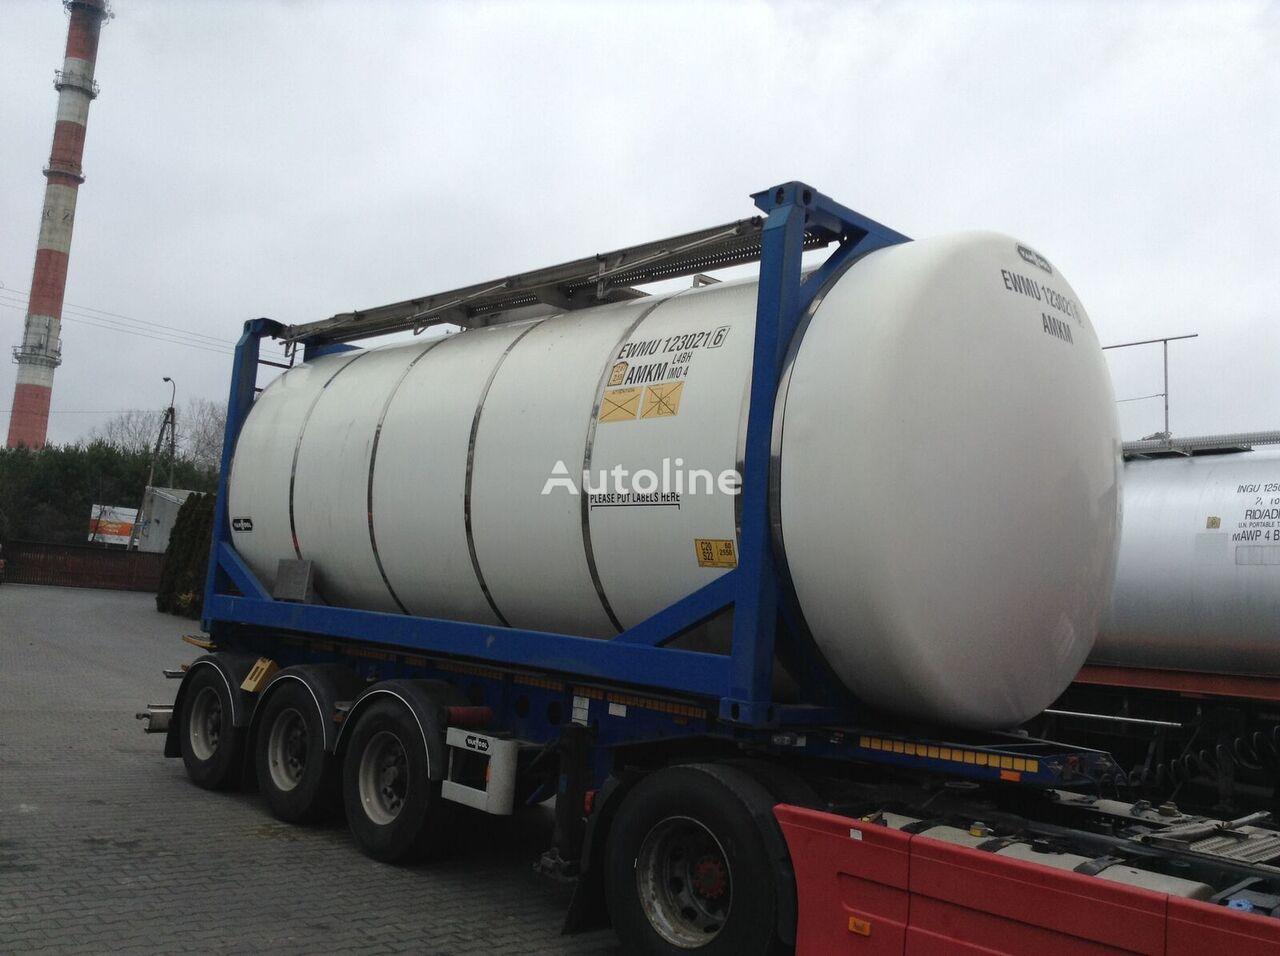 VAN HOOL ADR 20ft tank container